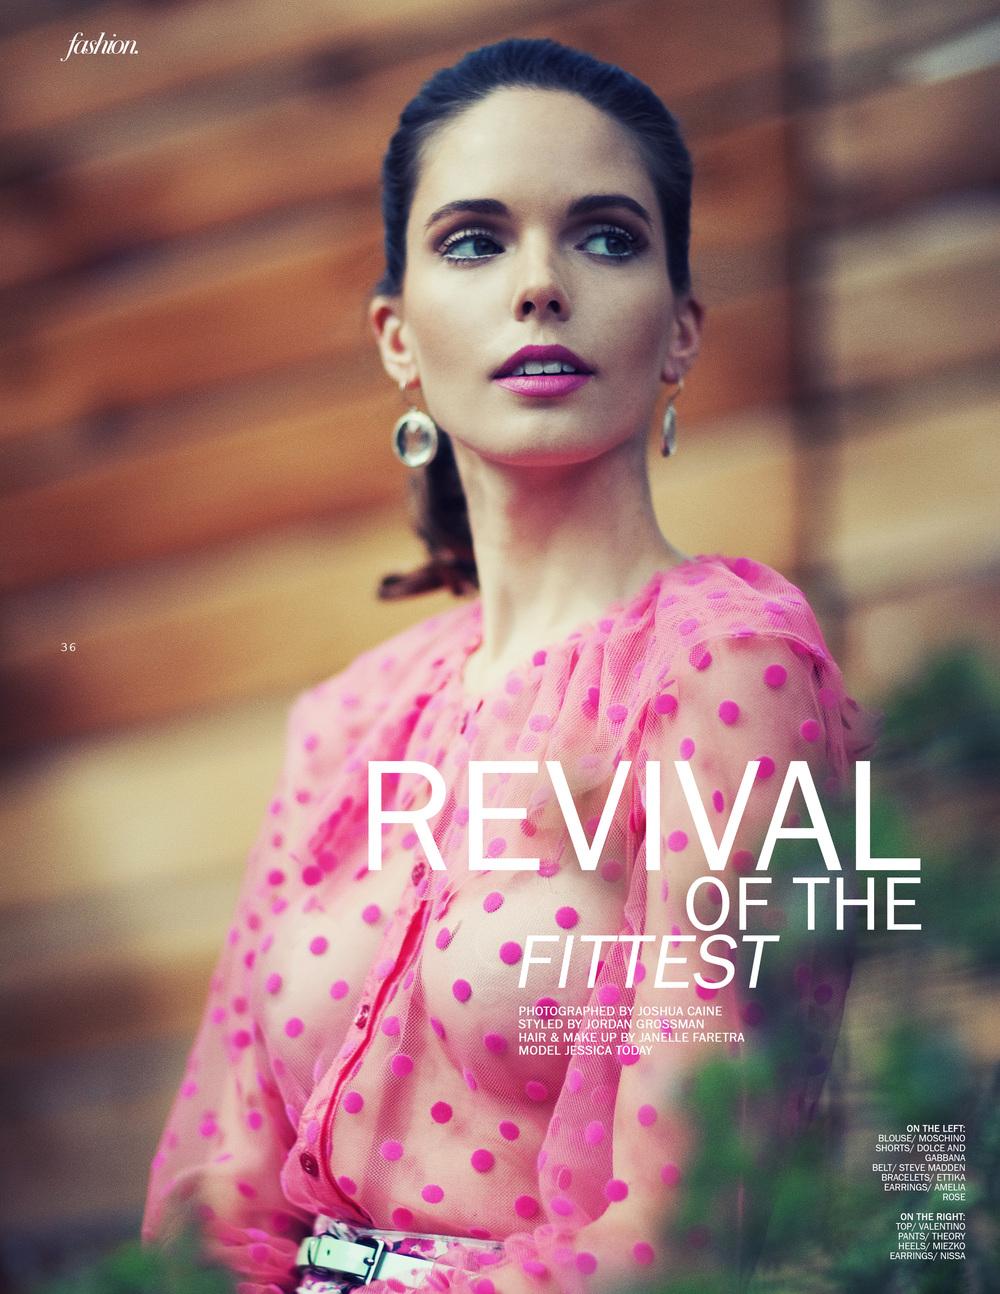 Photographed by Joshua Caine Fashion Editor Jordan Grossman Hair/Mua Janelle Faretra Model Jessica Today